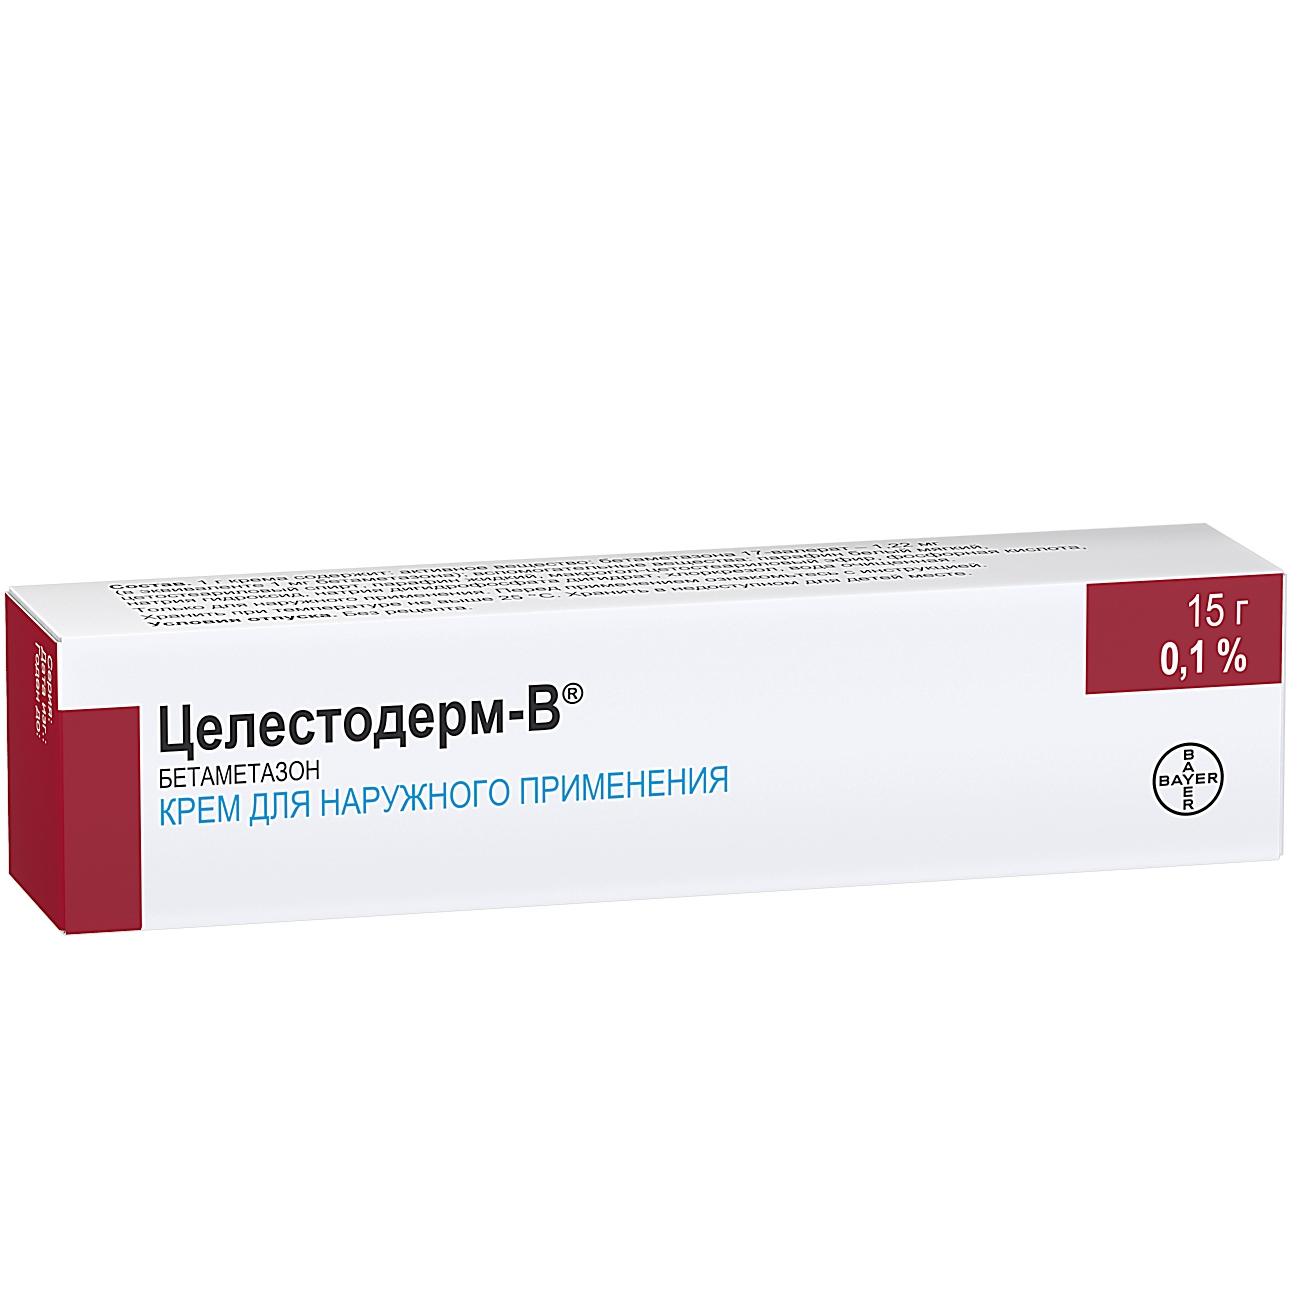 Целестодерм в крем 0,1% 15г n1